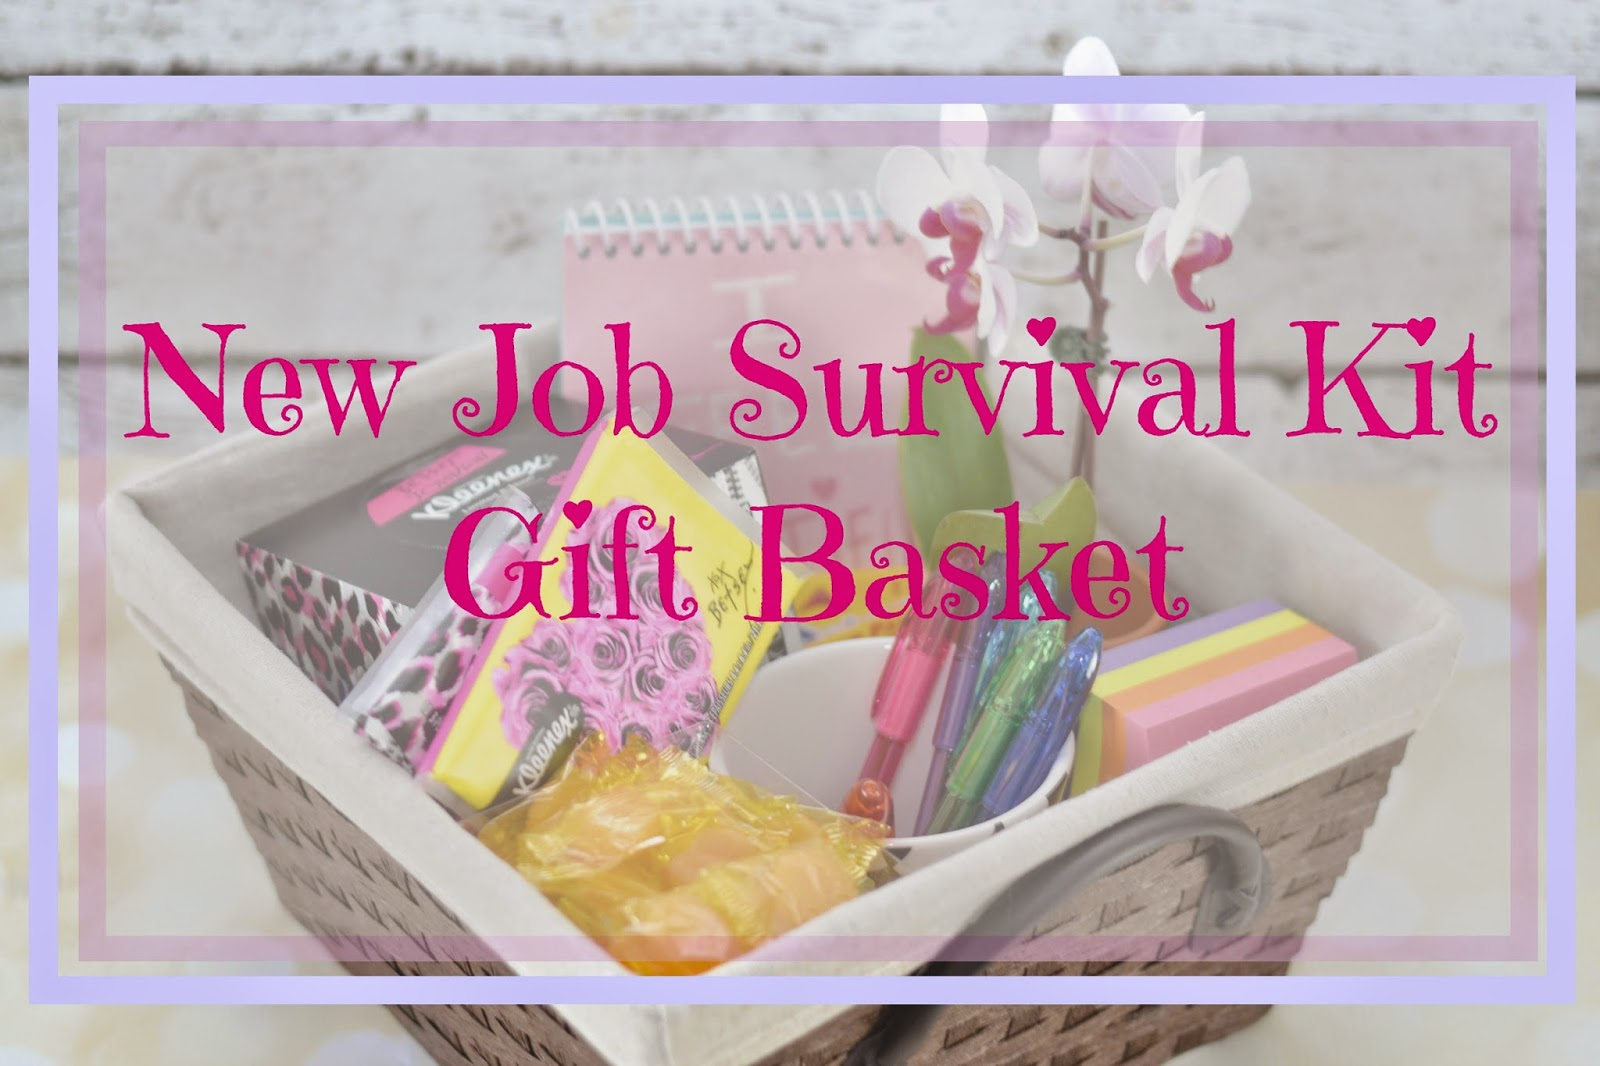 ... , Congratulations on the new job. New Job Survival Kit Gift Basket